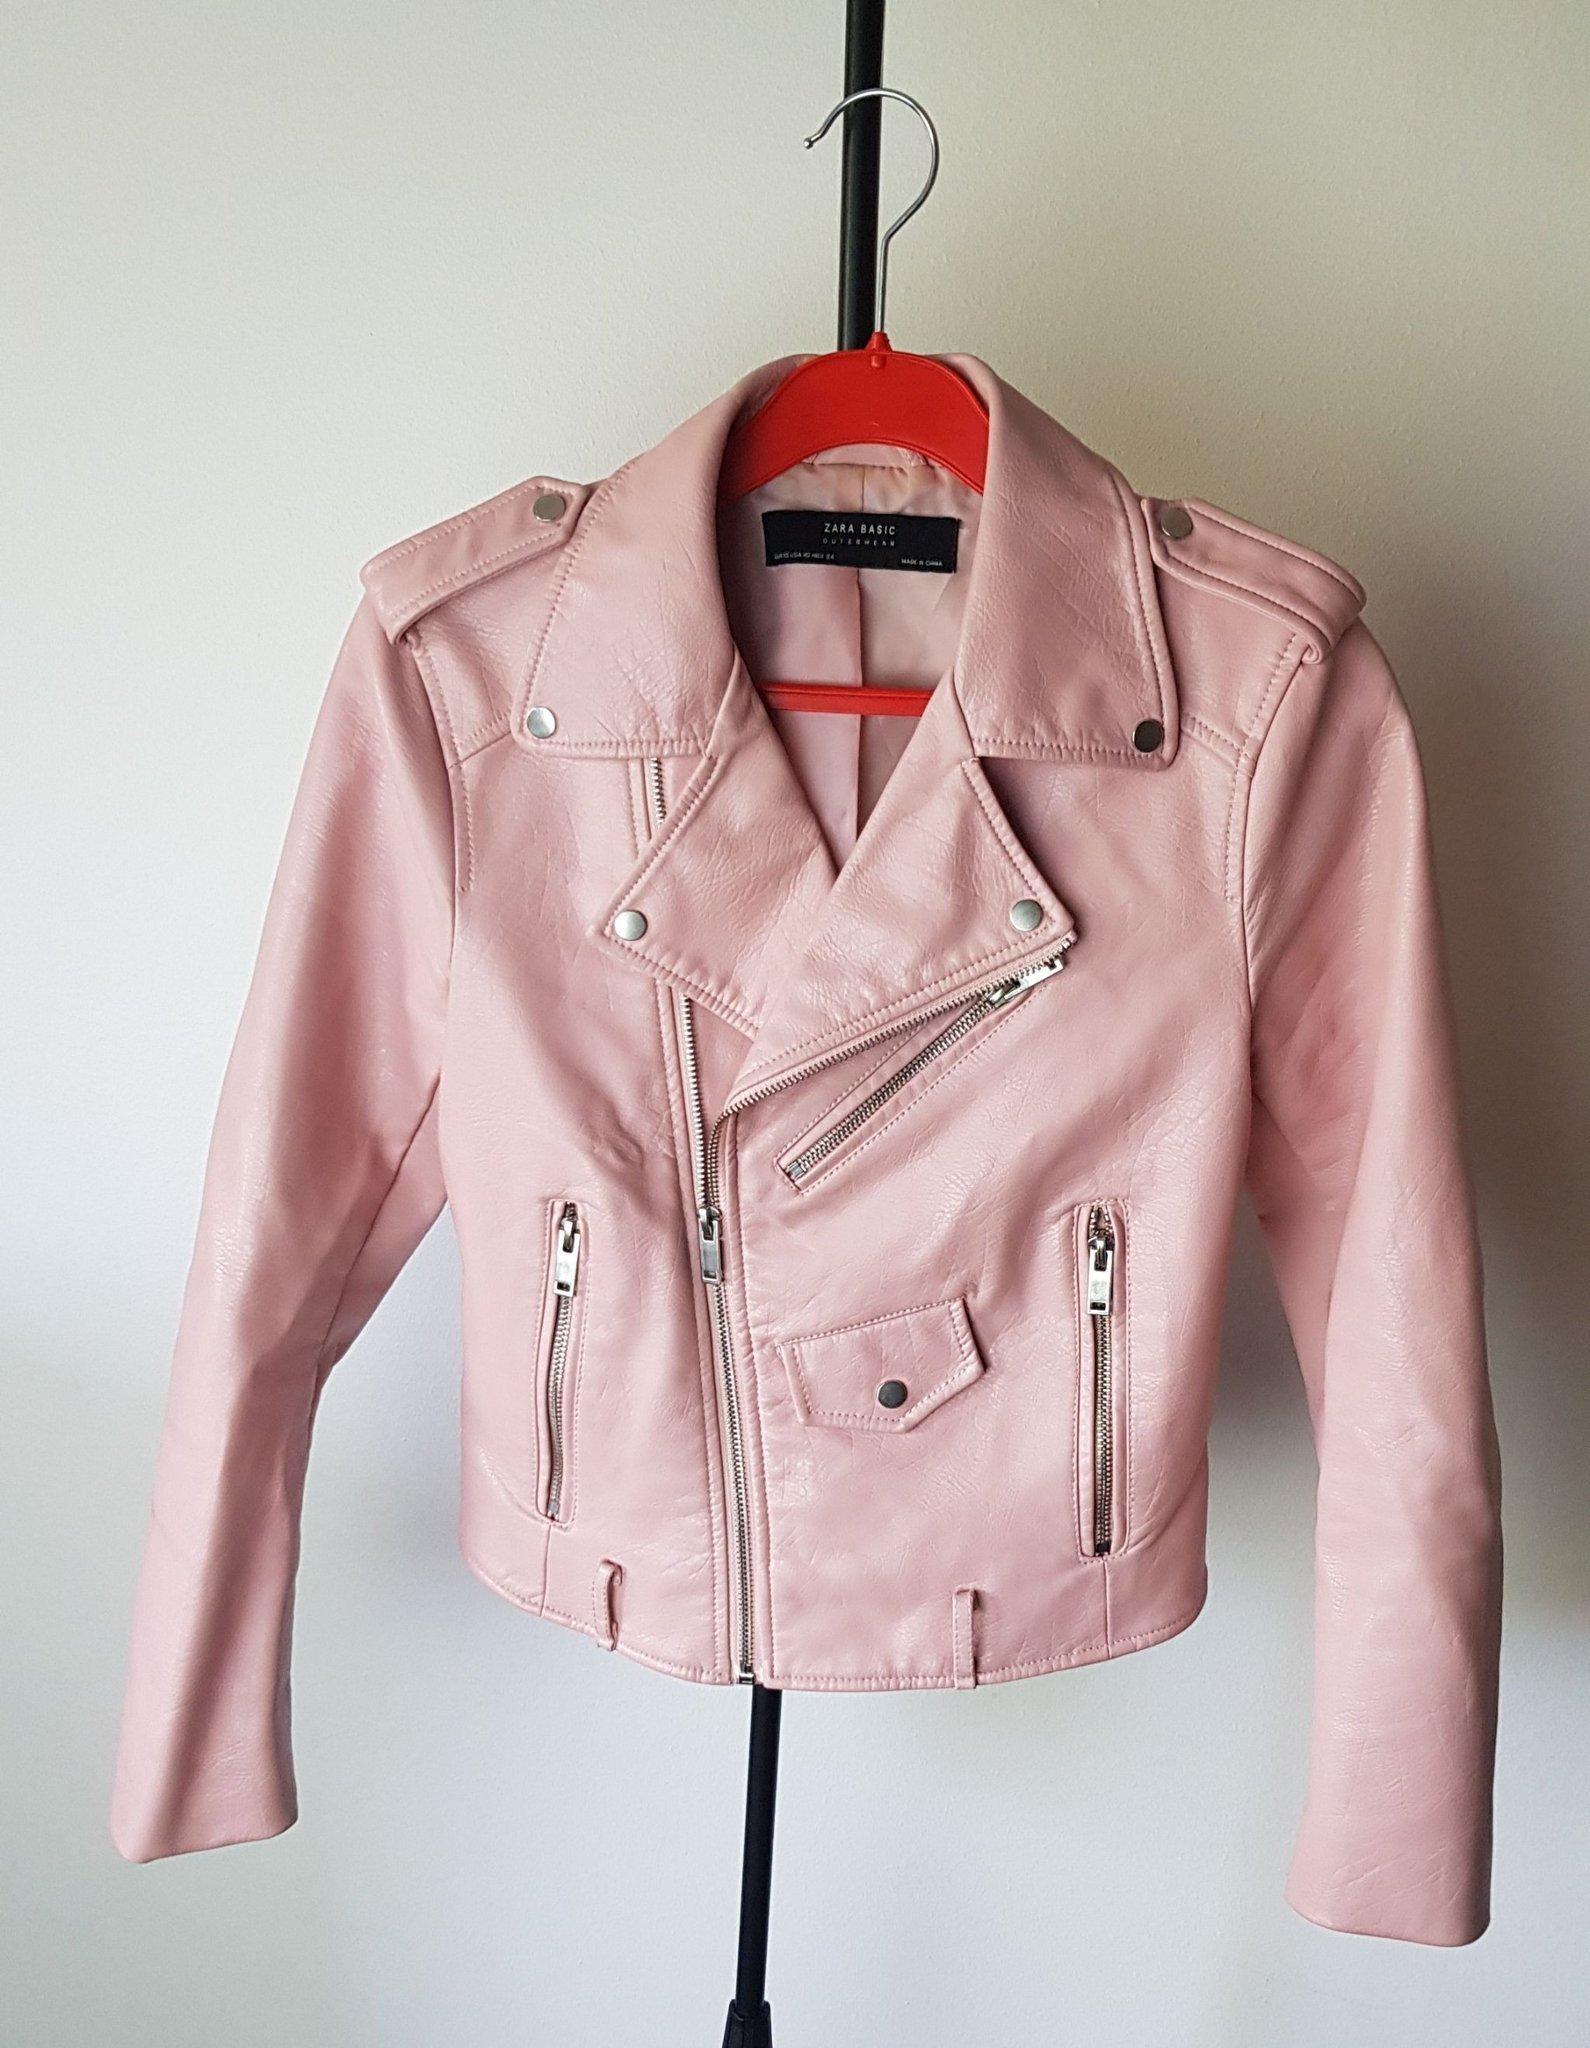 Zara basic outerwear skinnjacka rosa strl xs (401186410) ᐈ